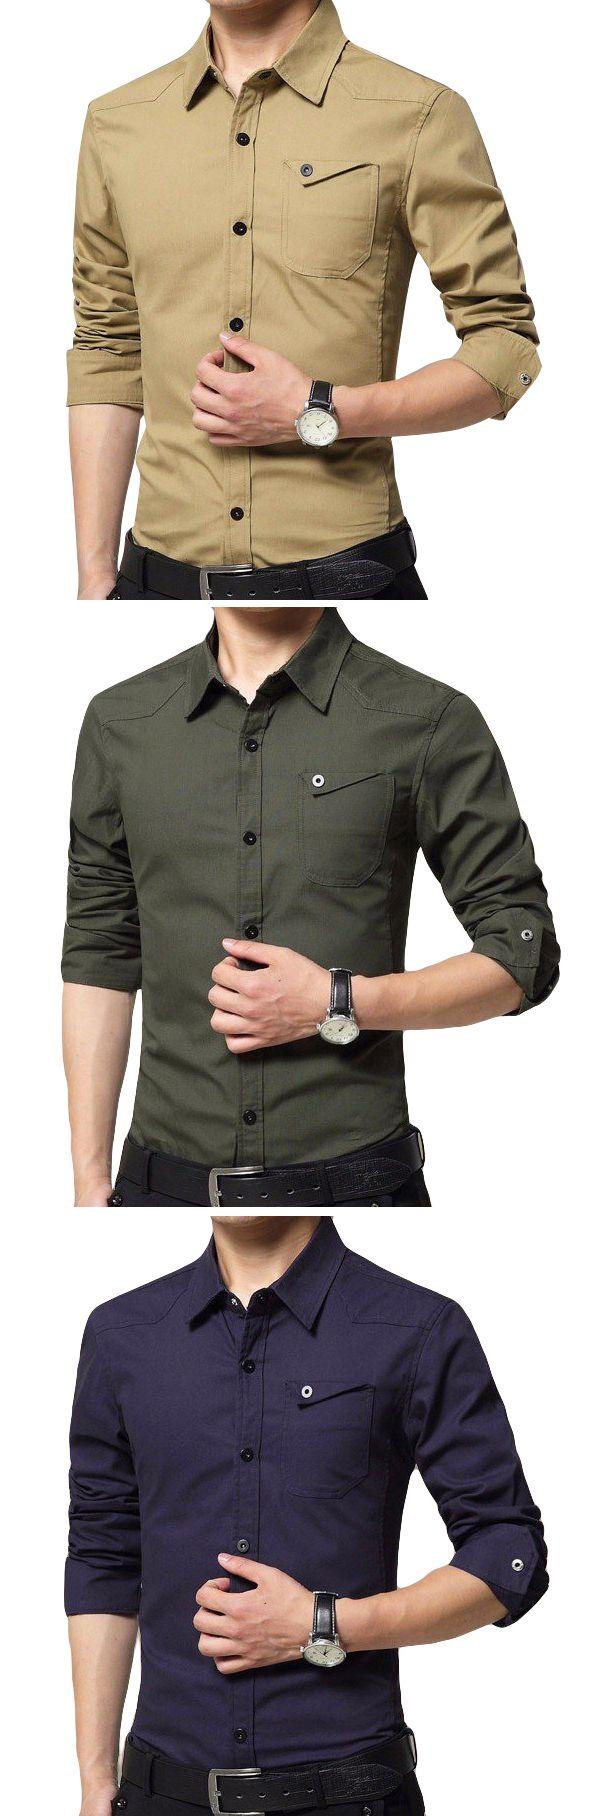 Plus size womens flannel shirt   best Shirts images on Pinterest  Man shirt Men shirt and